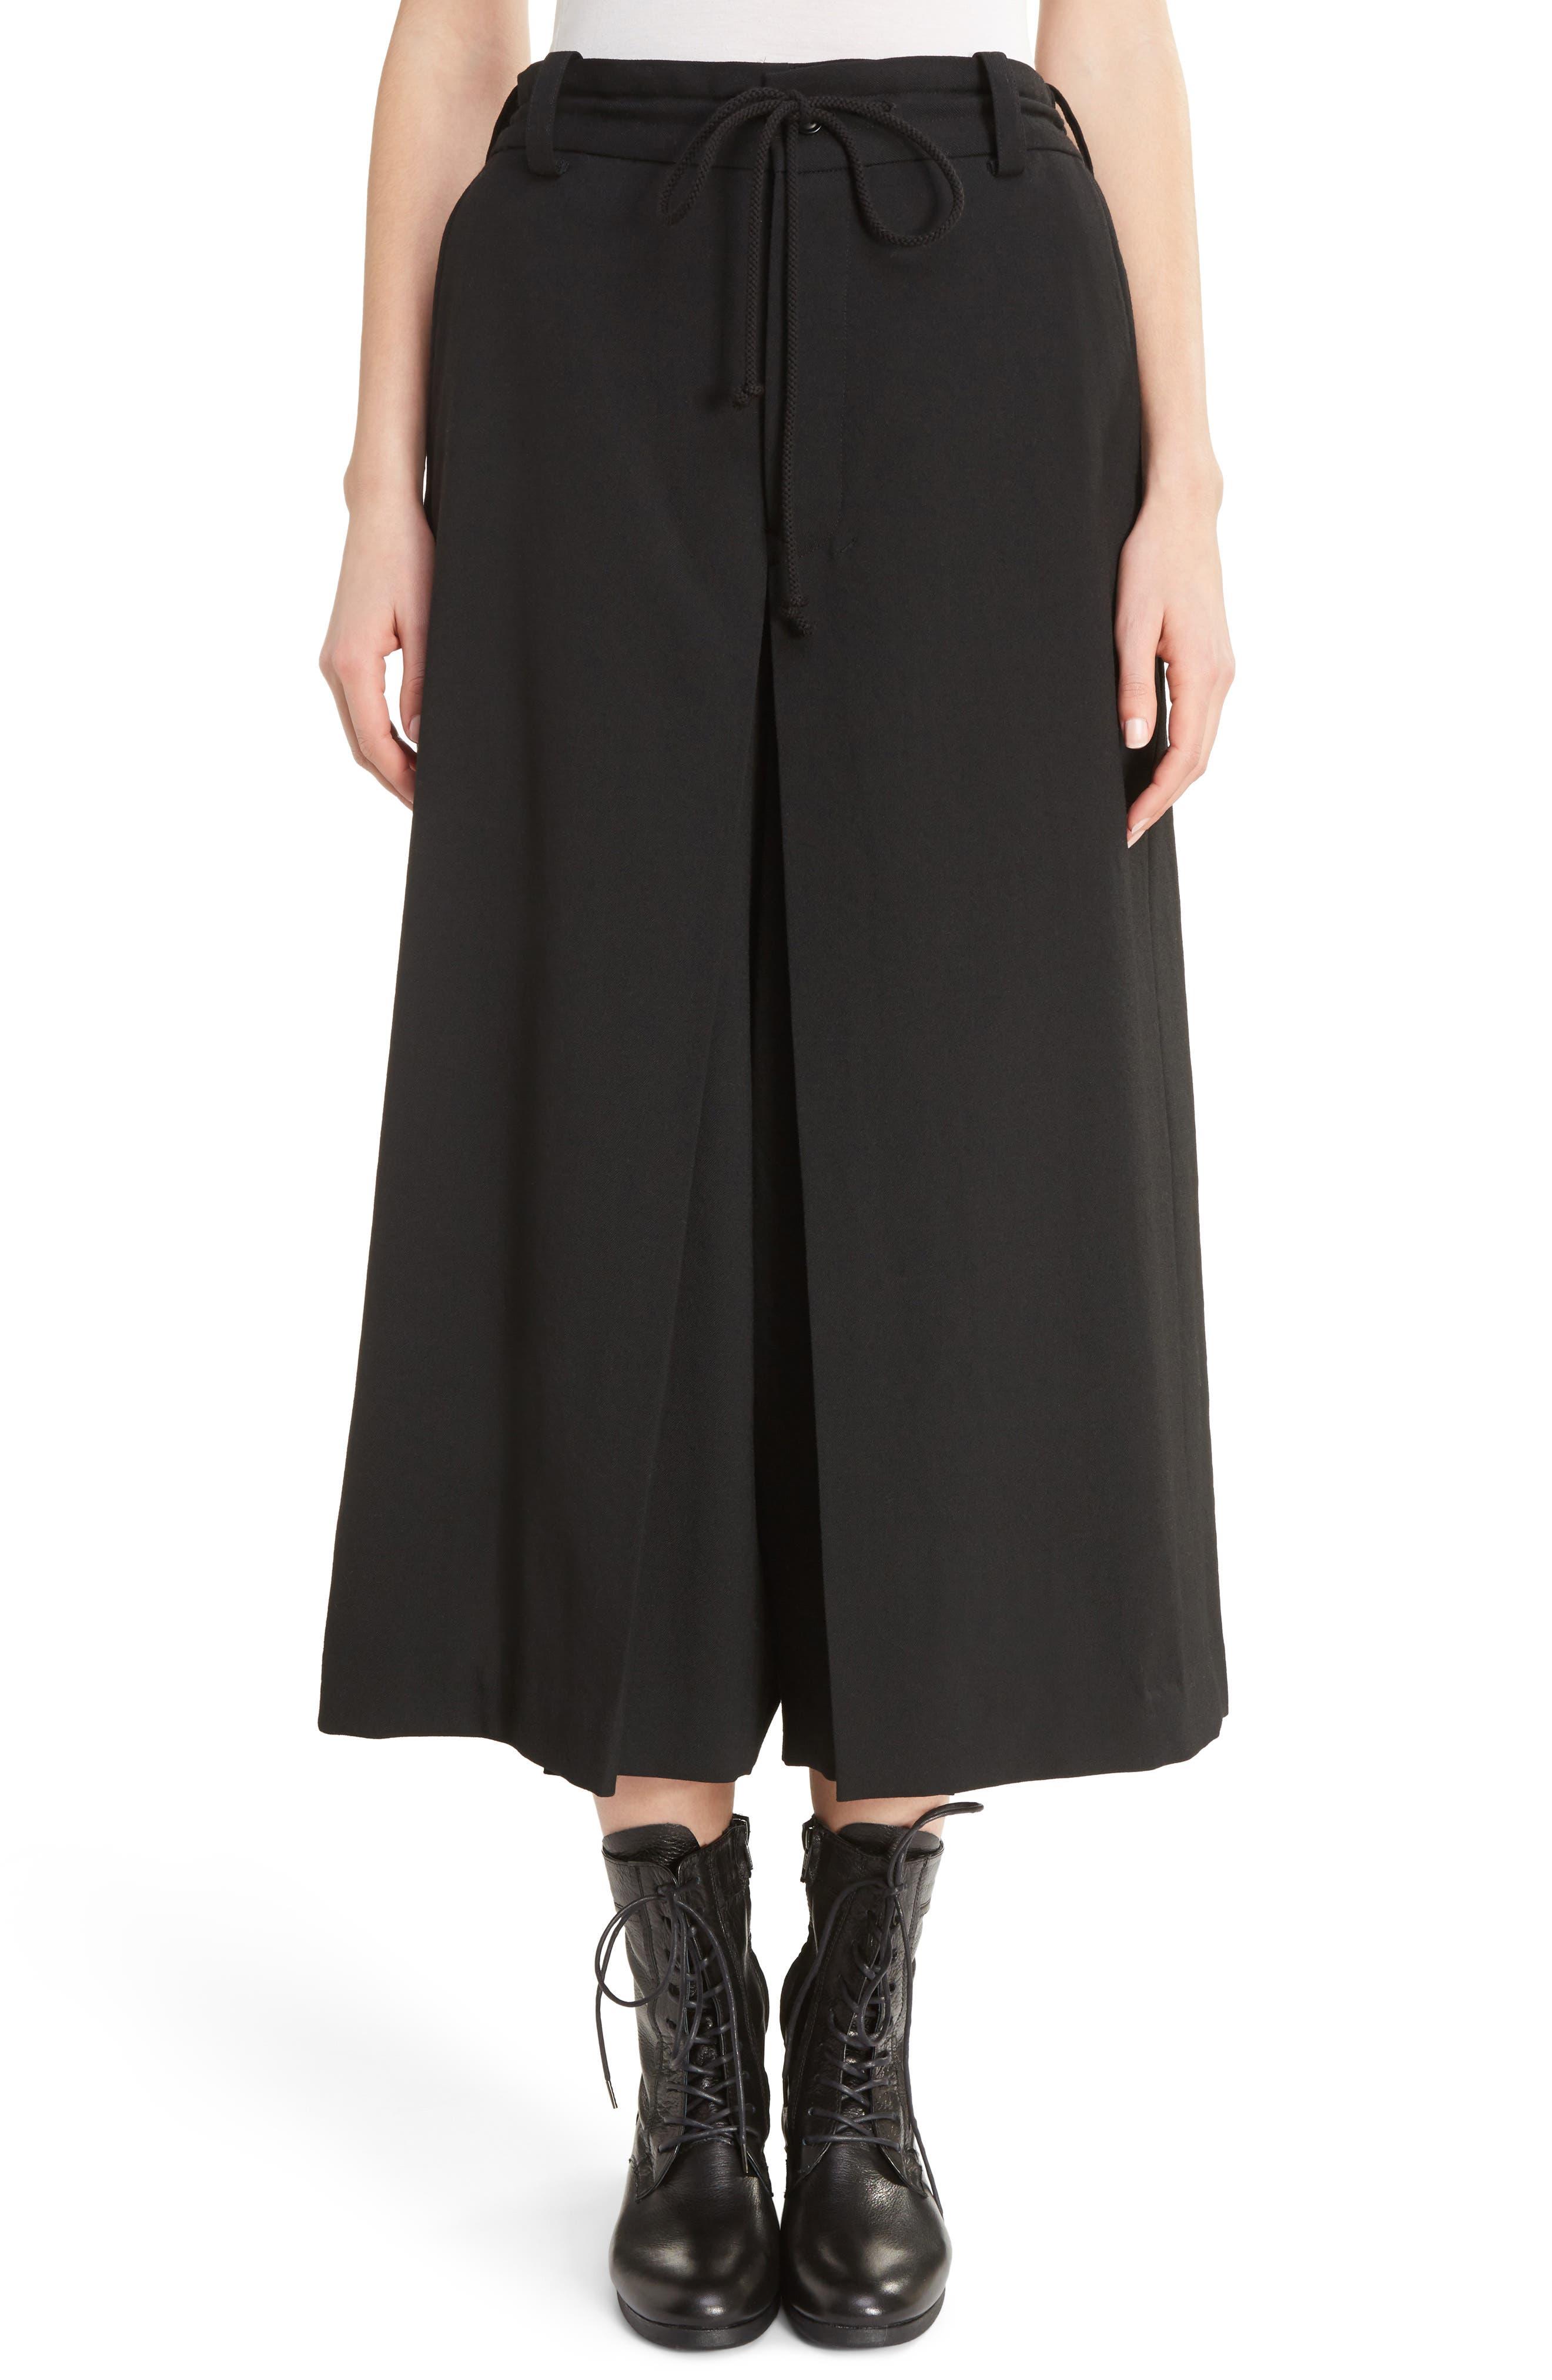 Y's by Yohji Yamamoto G-Gusset Tuck Front Wide Leg Pants